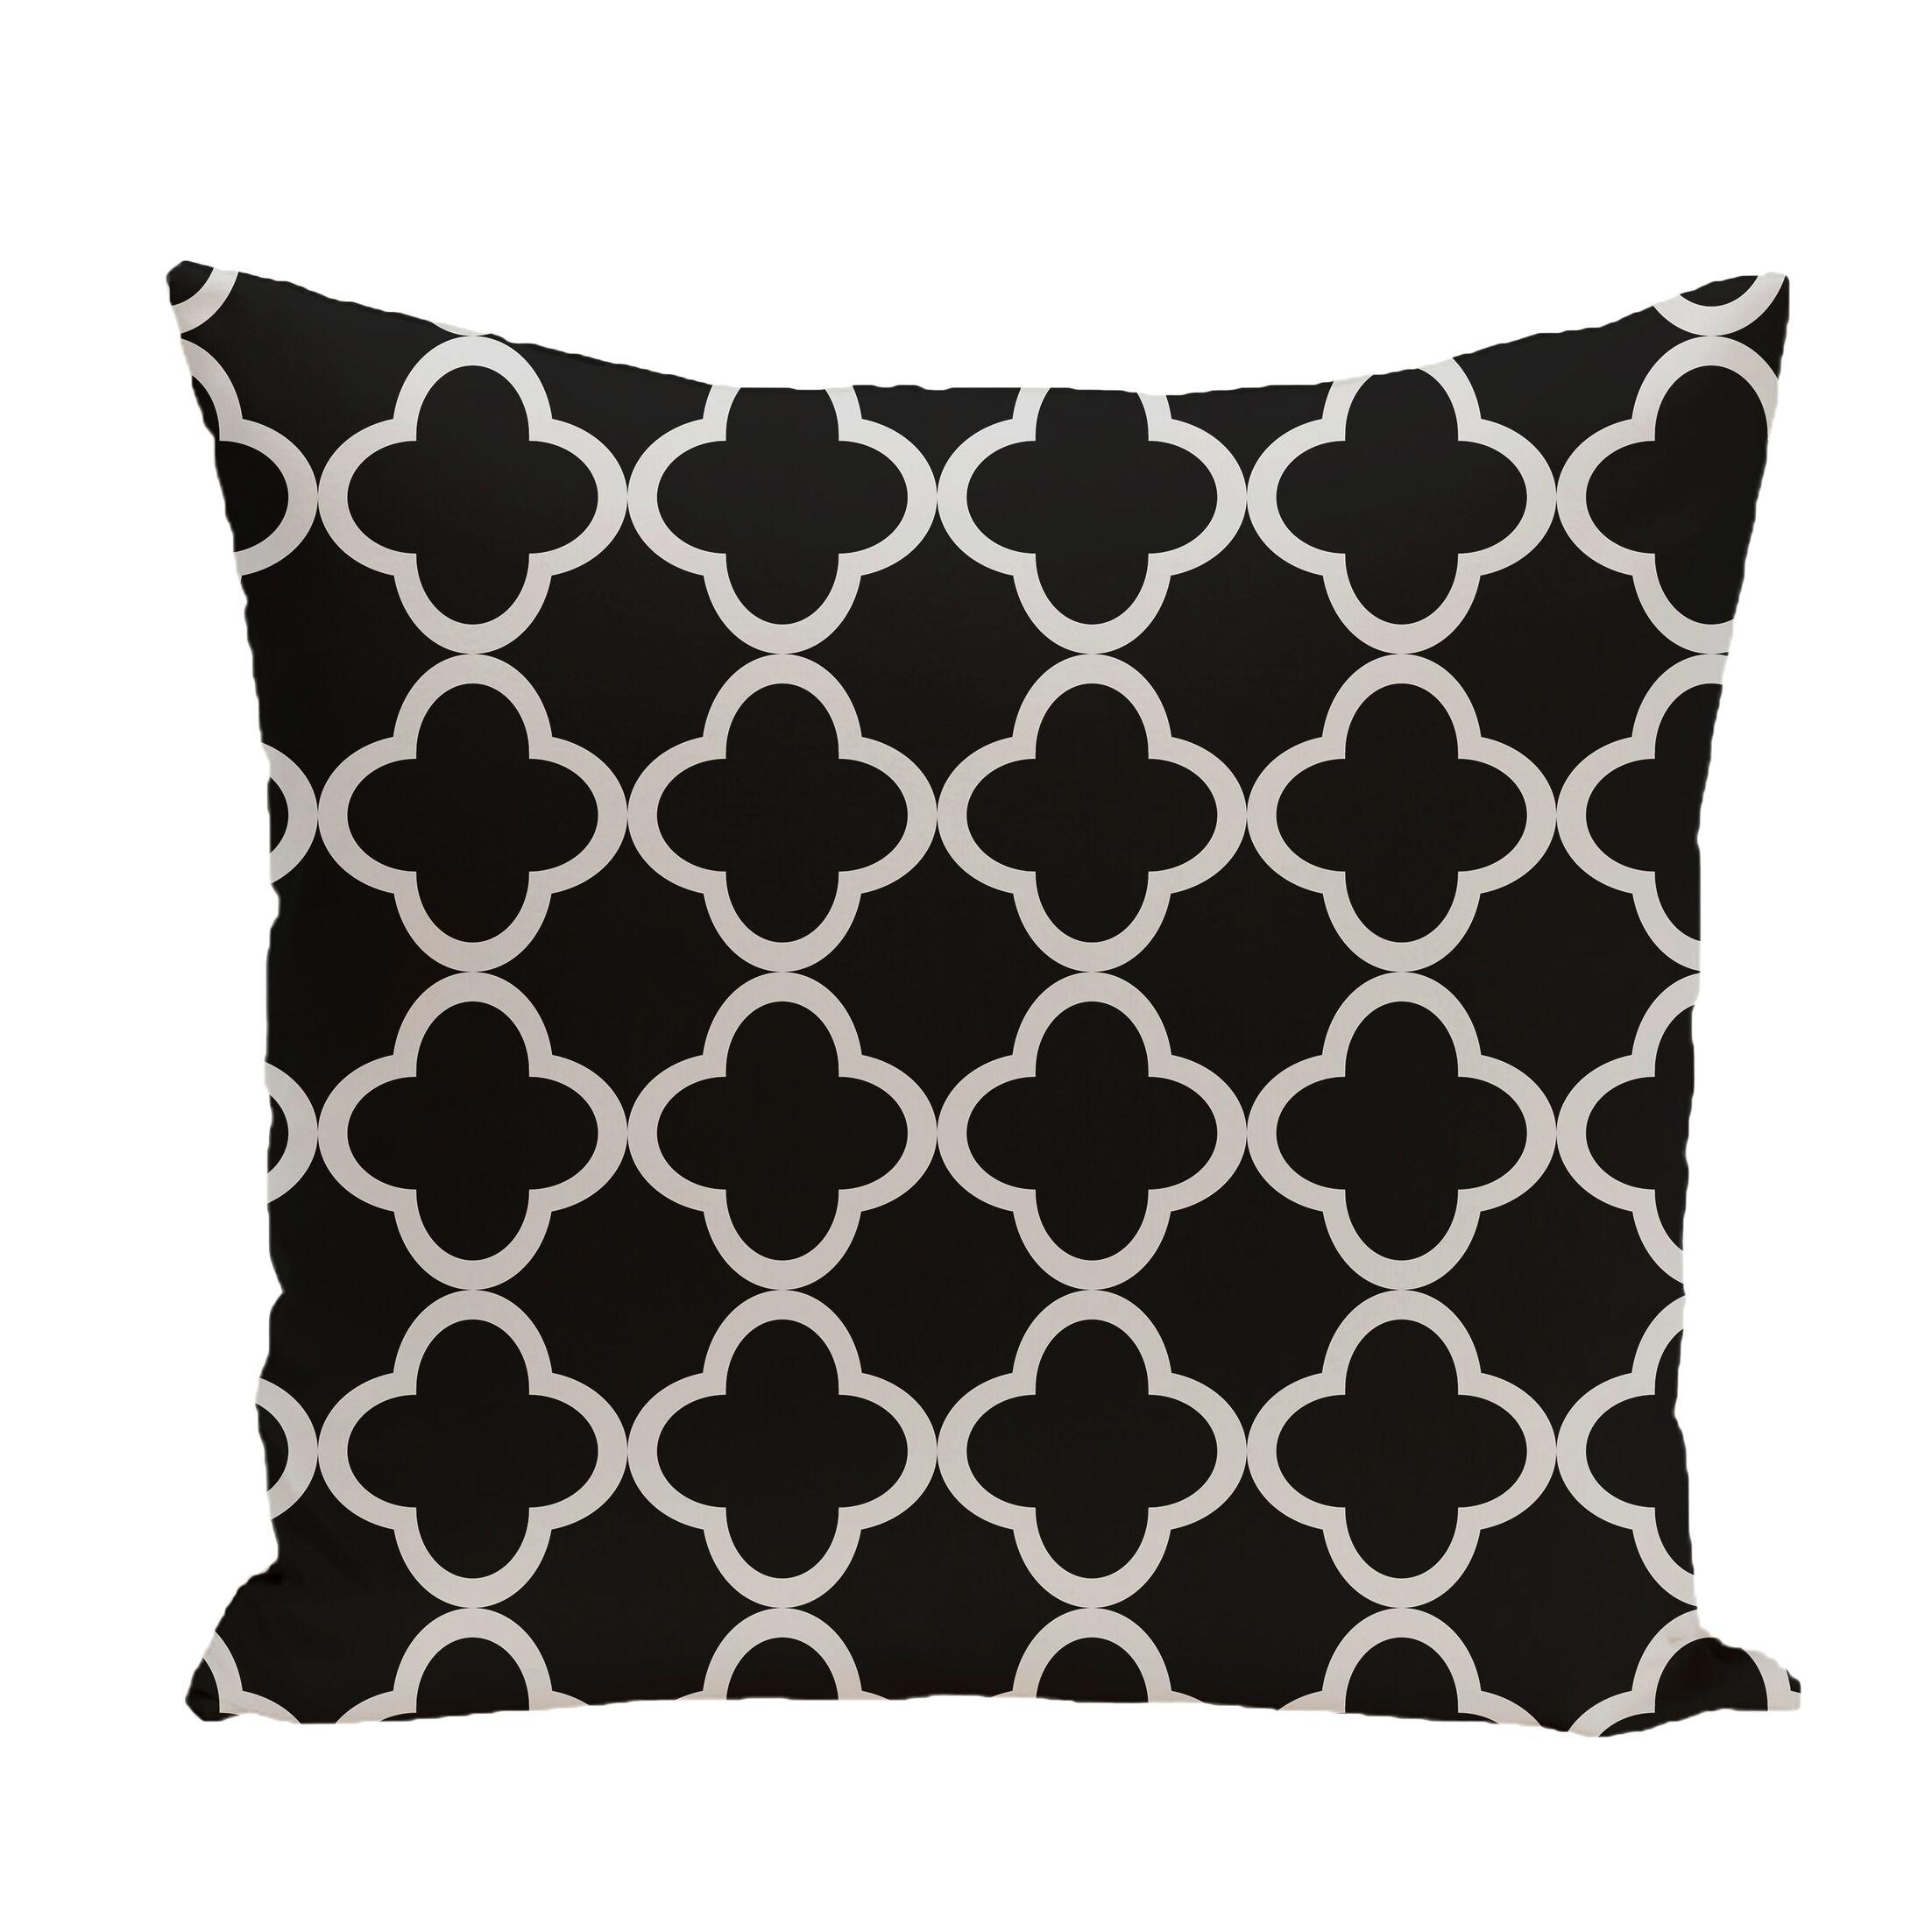 Marrakech Express Geometric Print Throw Pillow Color: Raven, Size: 20